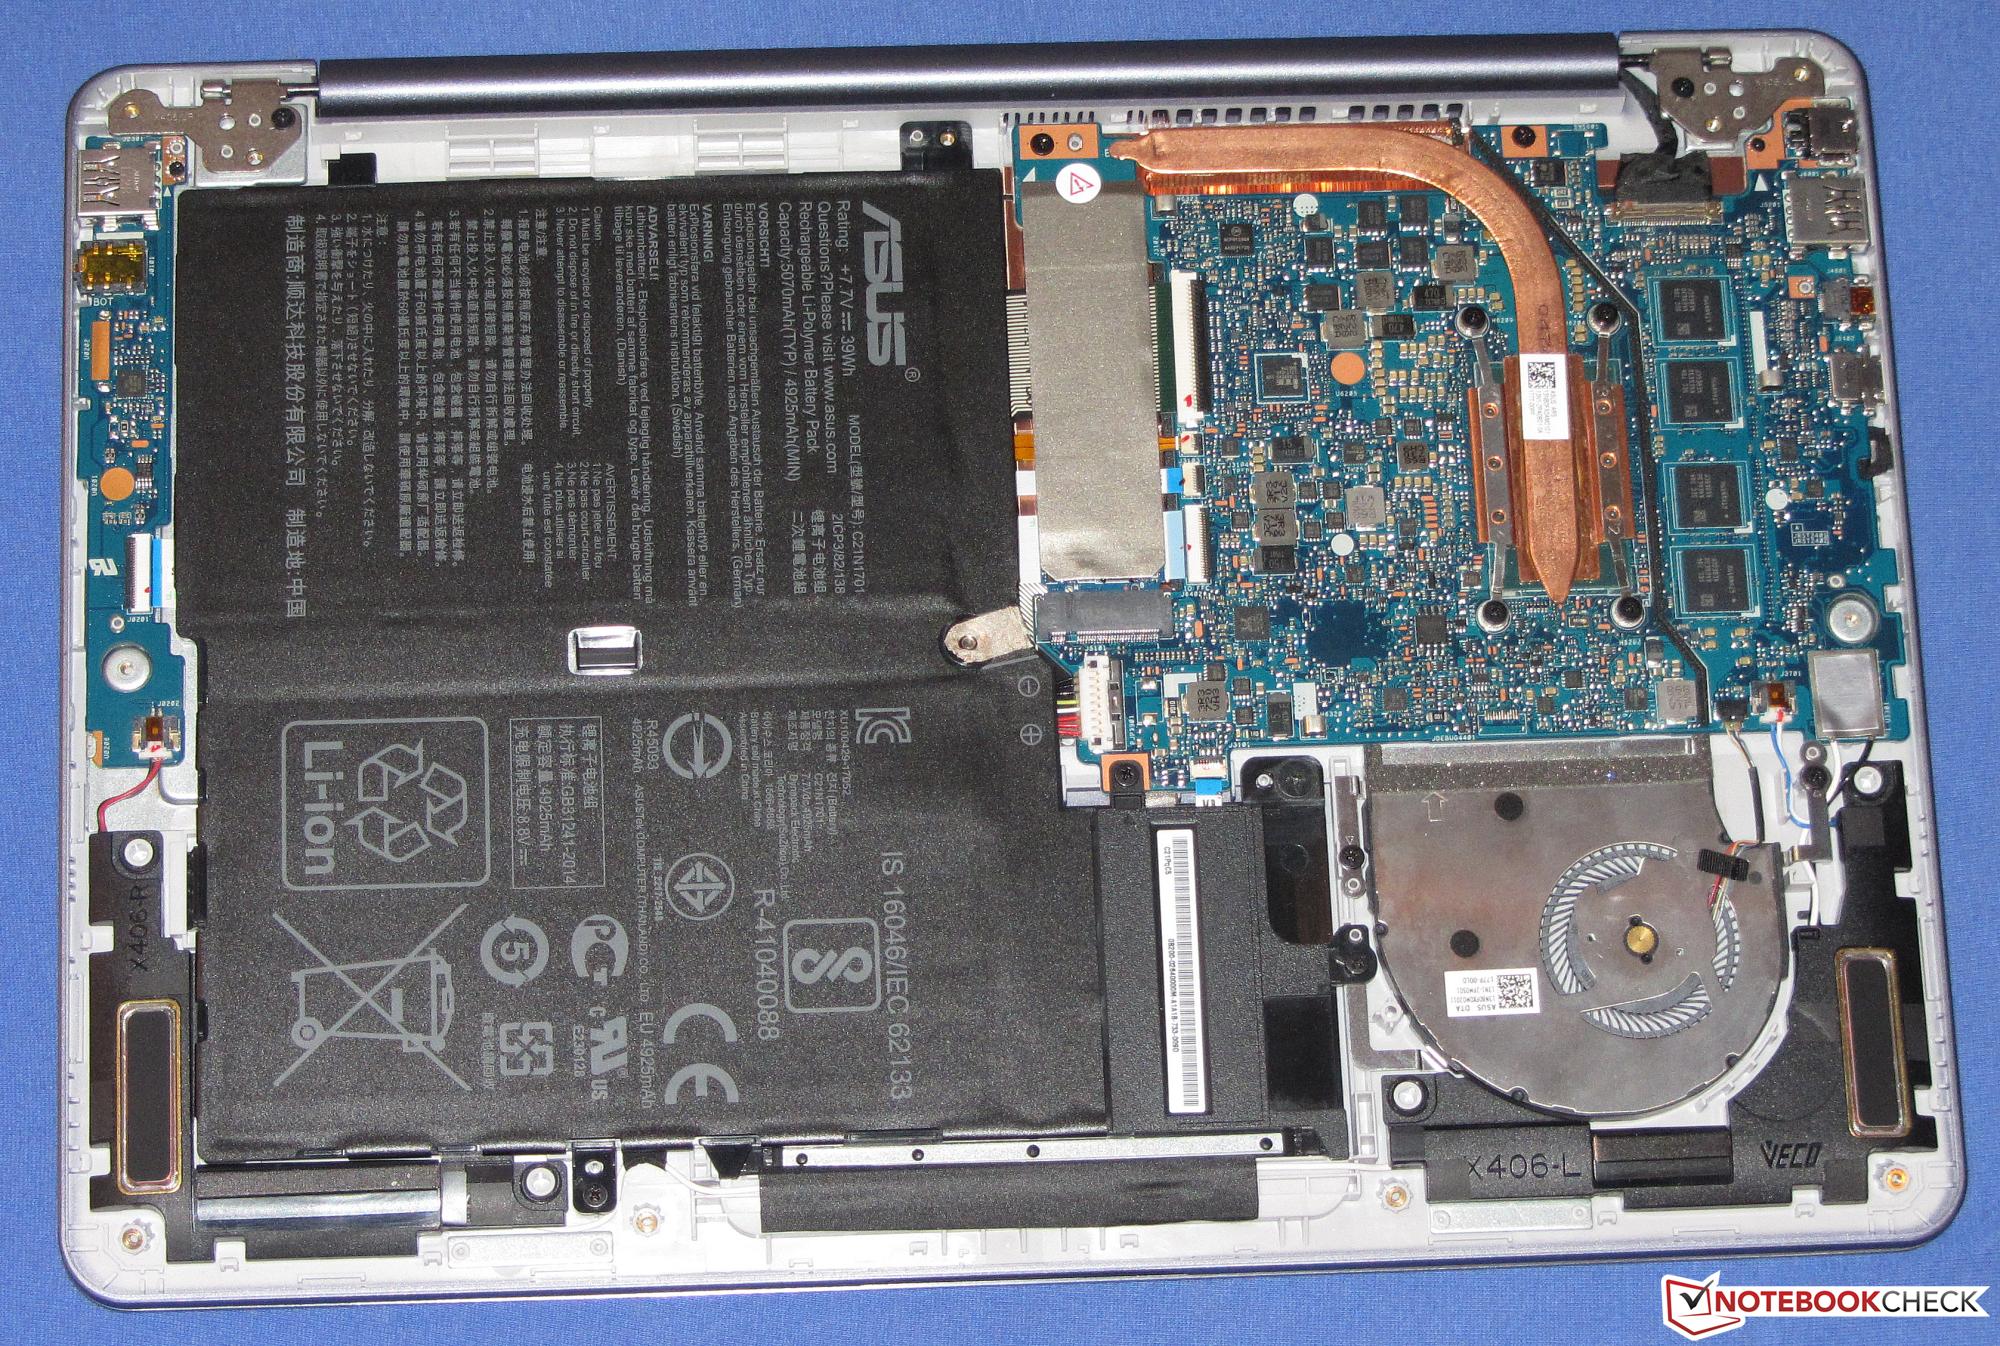 Asus VivoBook S14 S406UA (i5-8250U, SSD, HD) Laptop Review